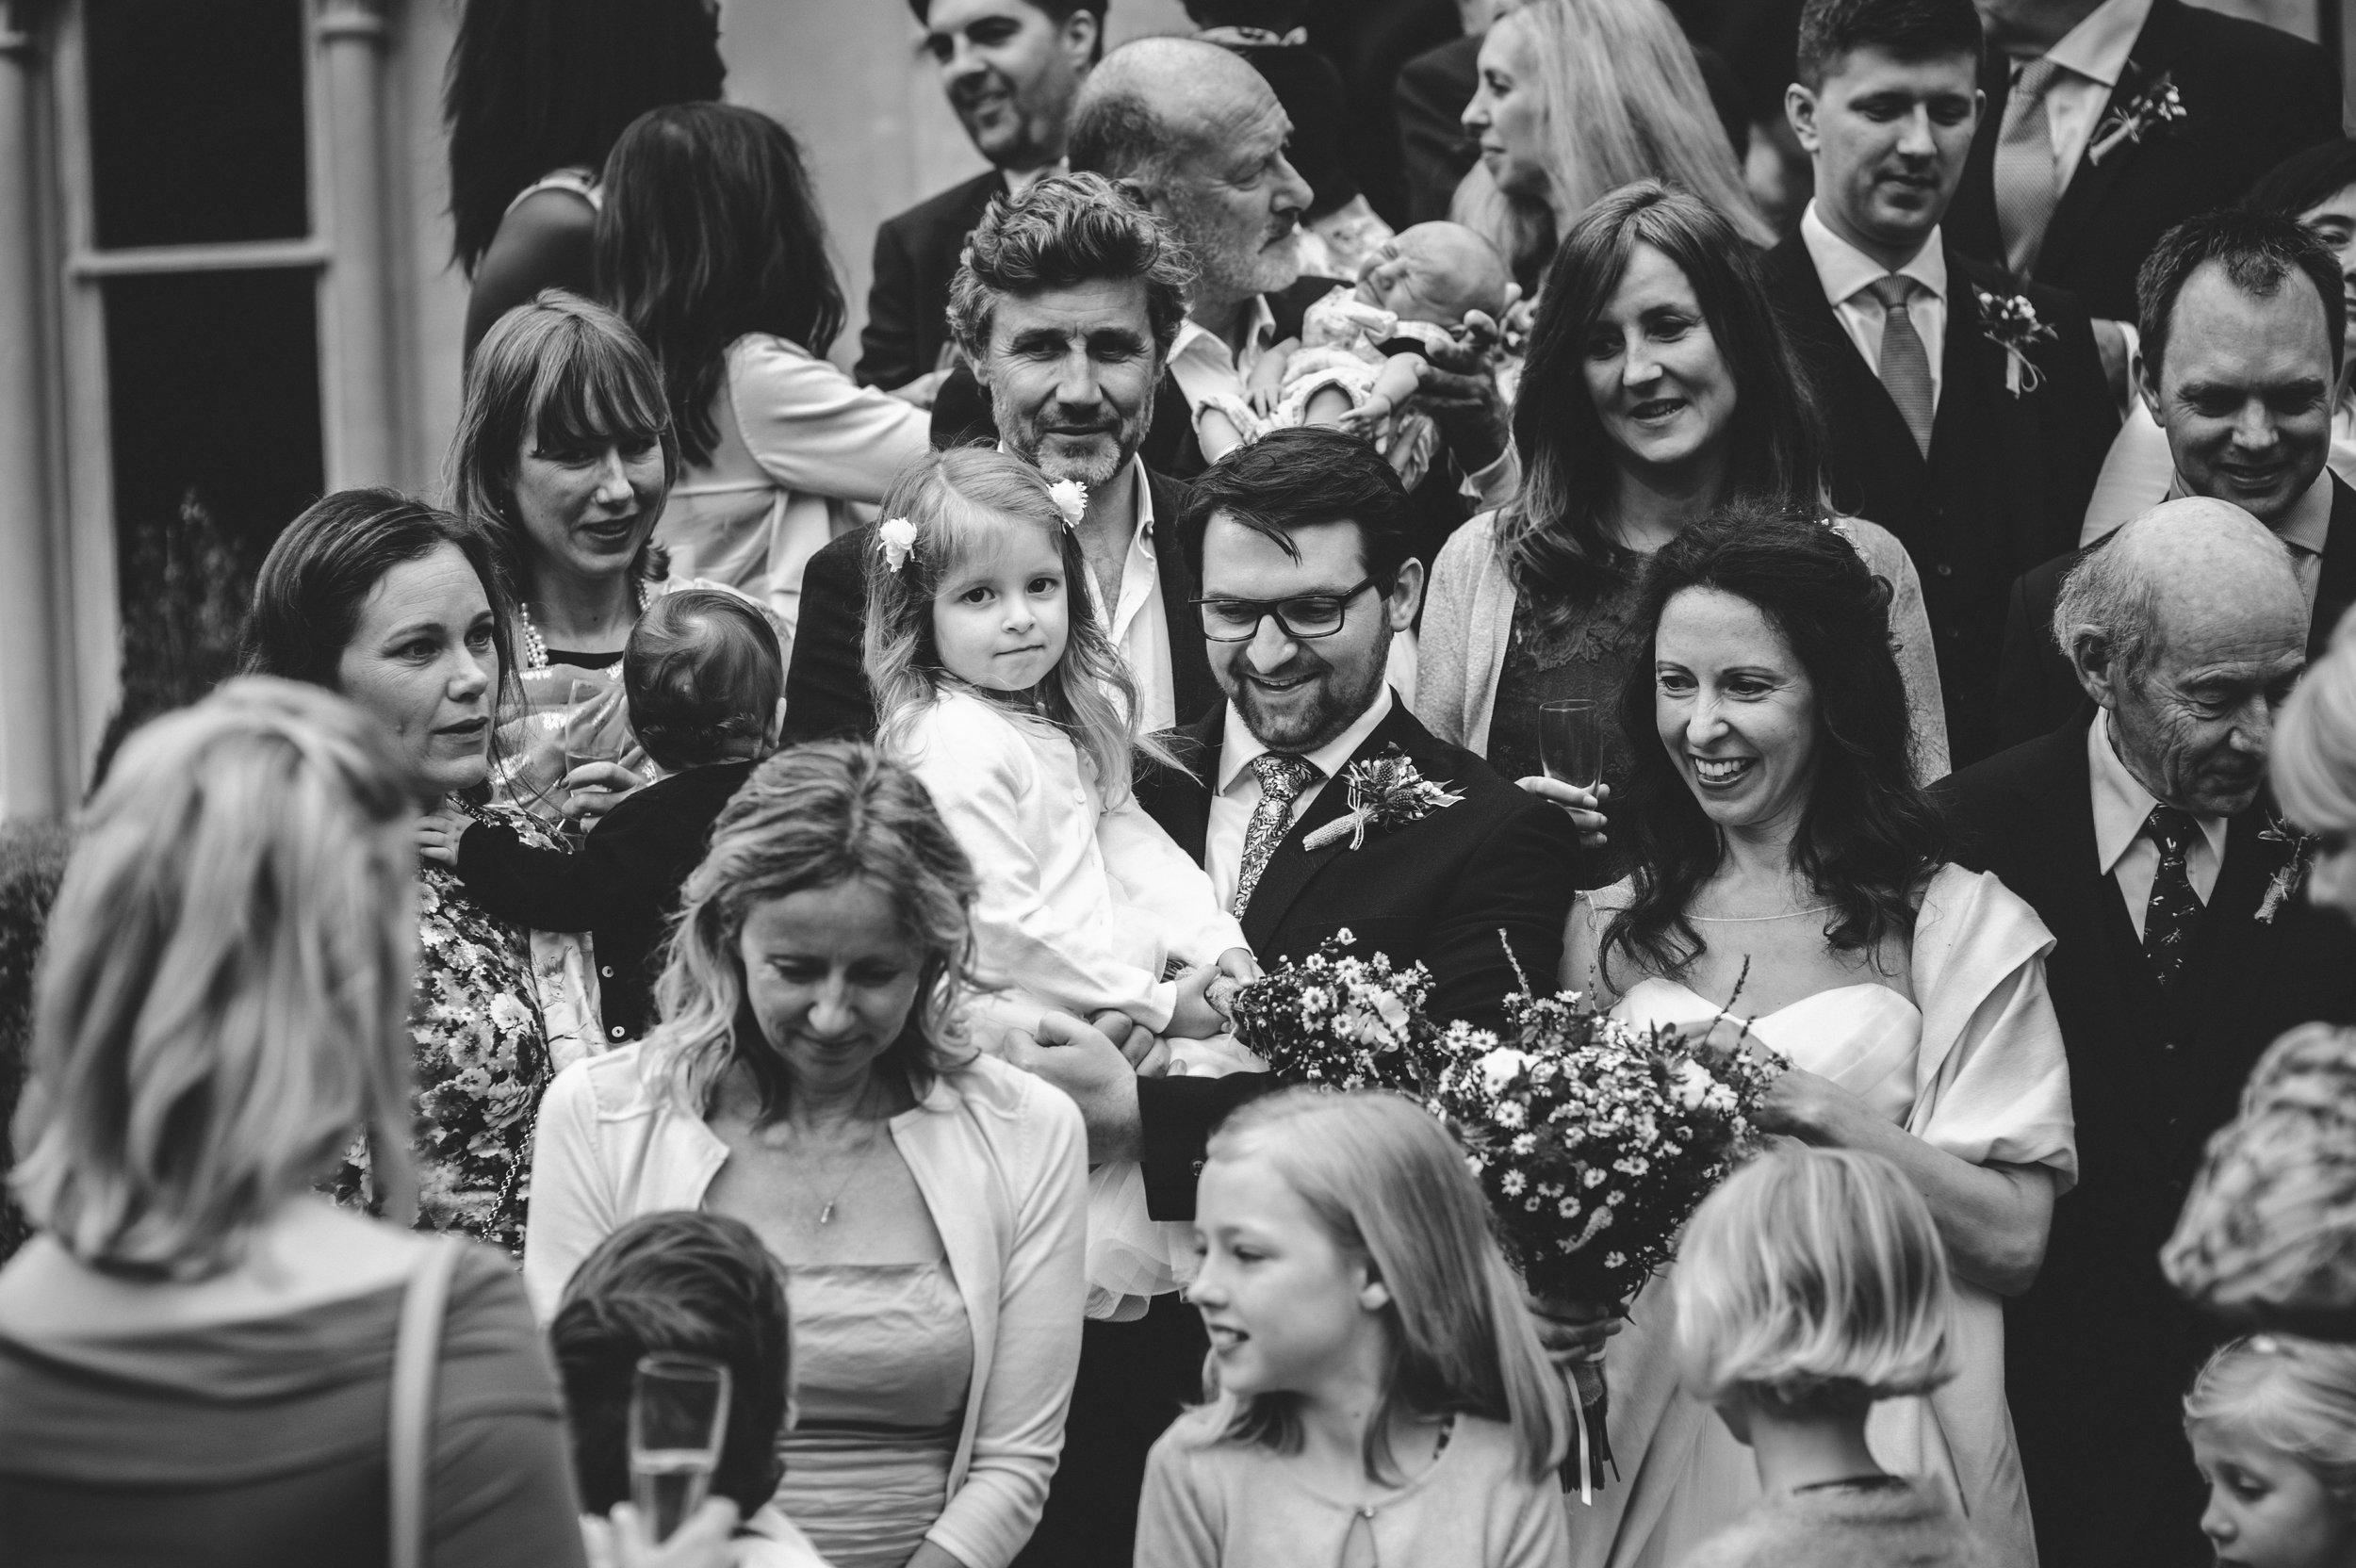 Beechfield house weddings - Abby and Greg (164 of 208).jpg